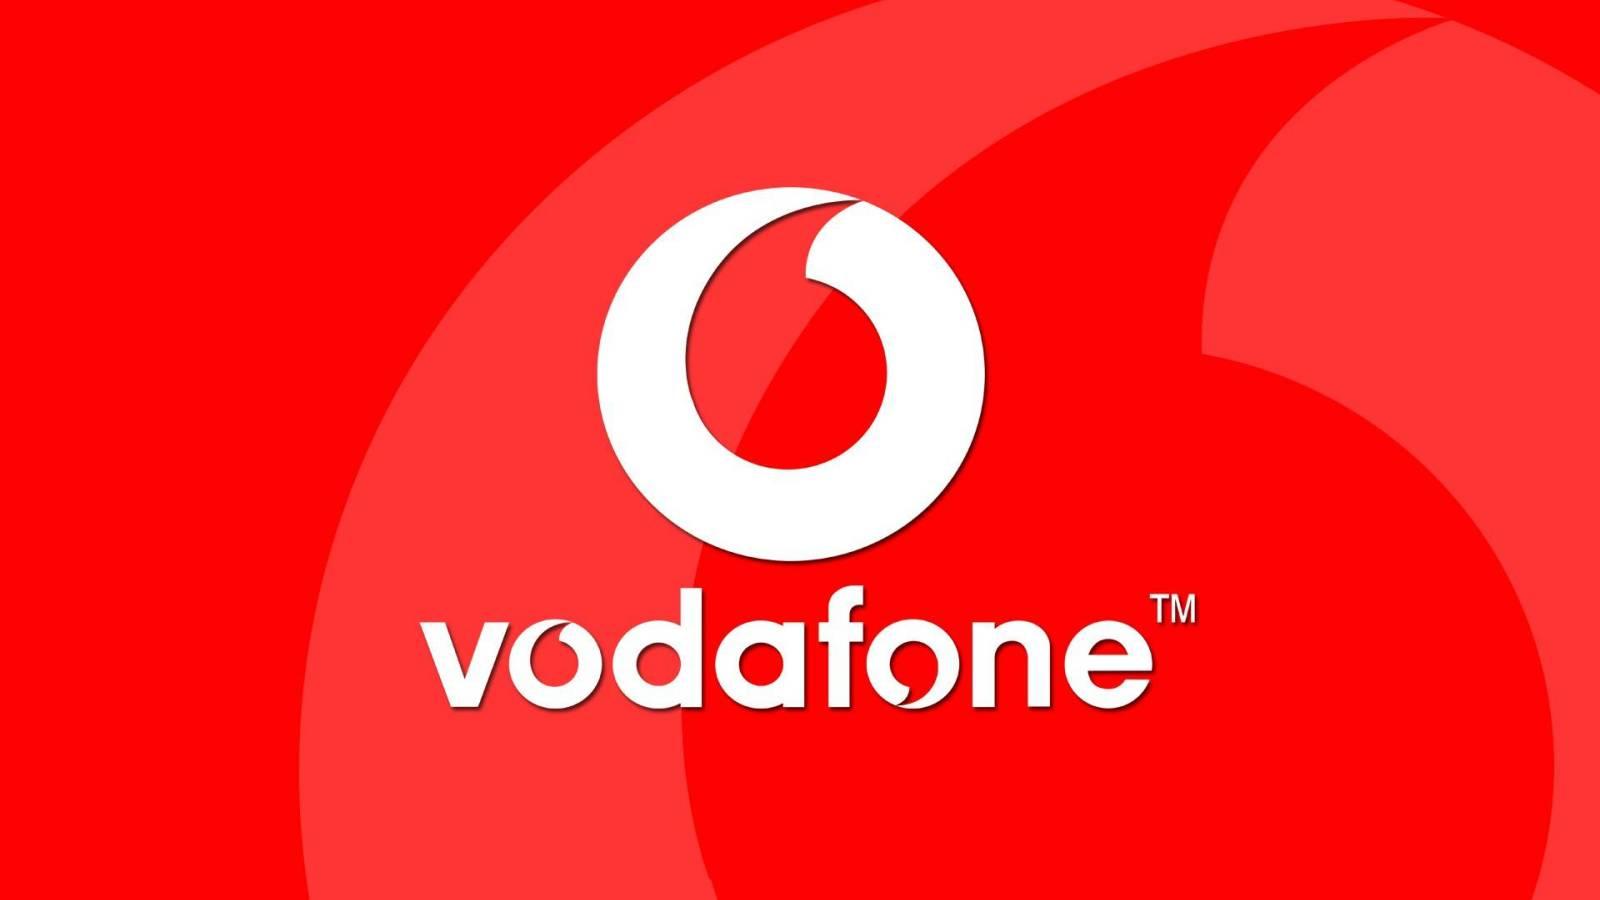 Vodafone regizor